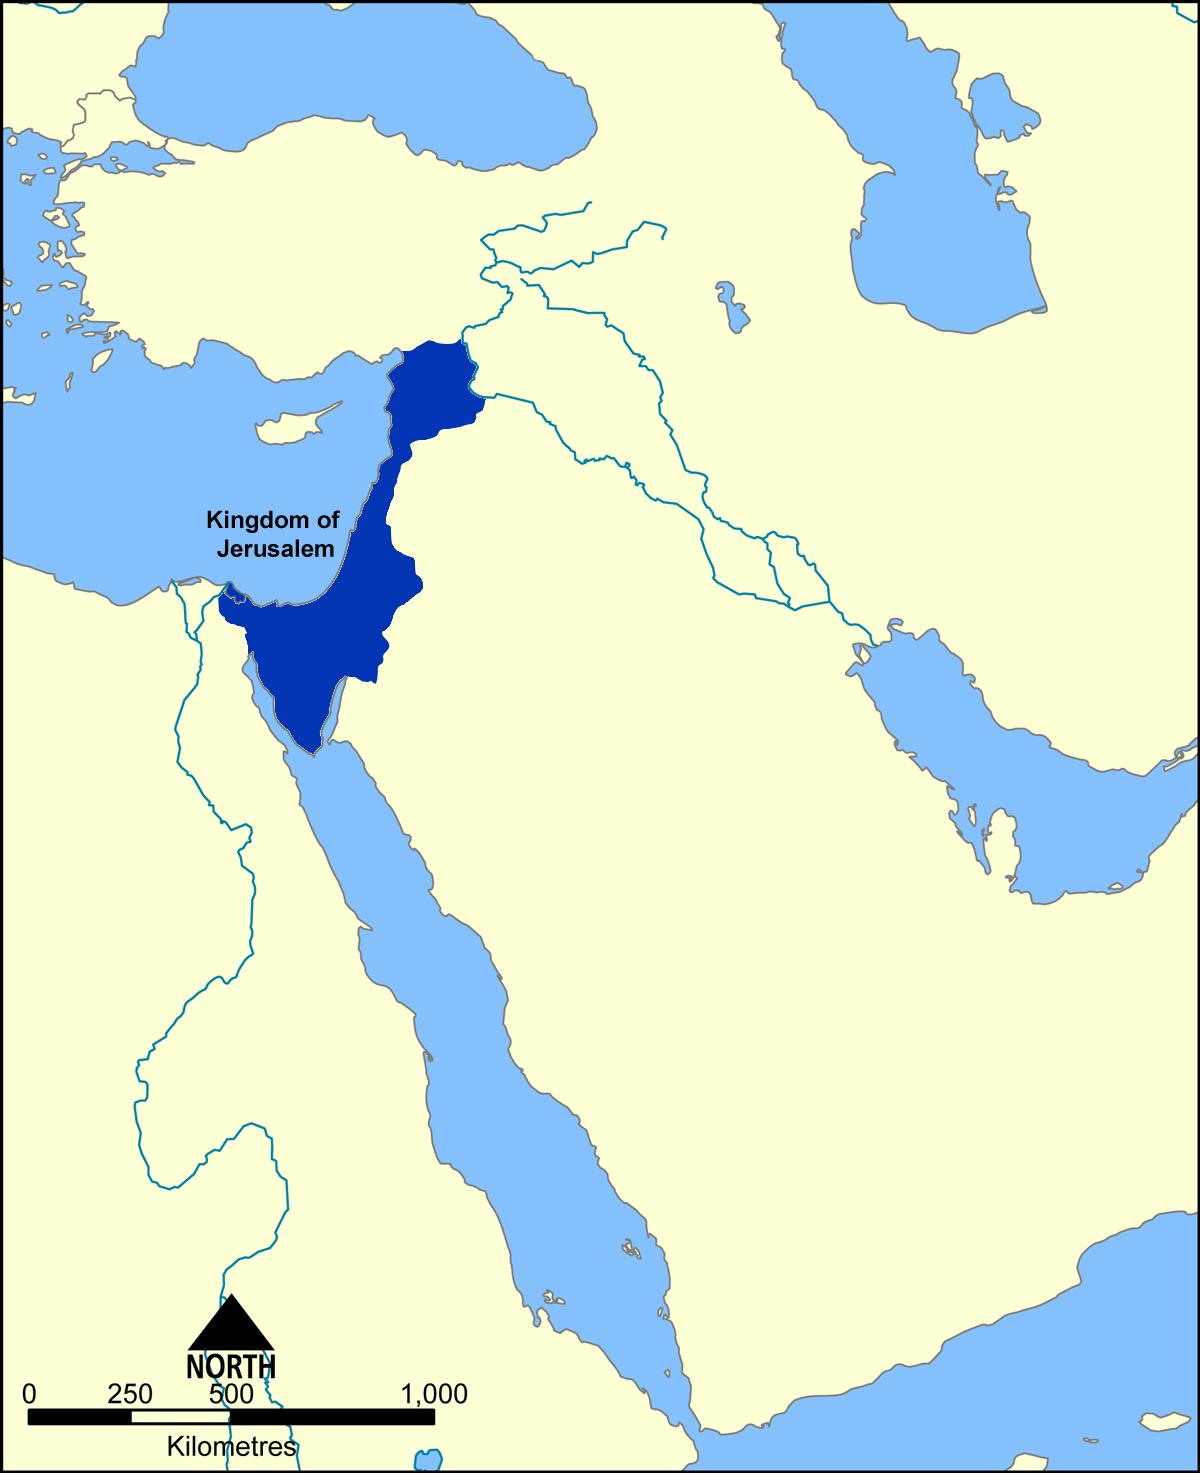 location of jerusalem on world map location free download images, electrical diagram, jerusalem world map location